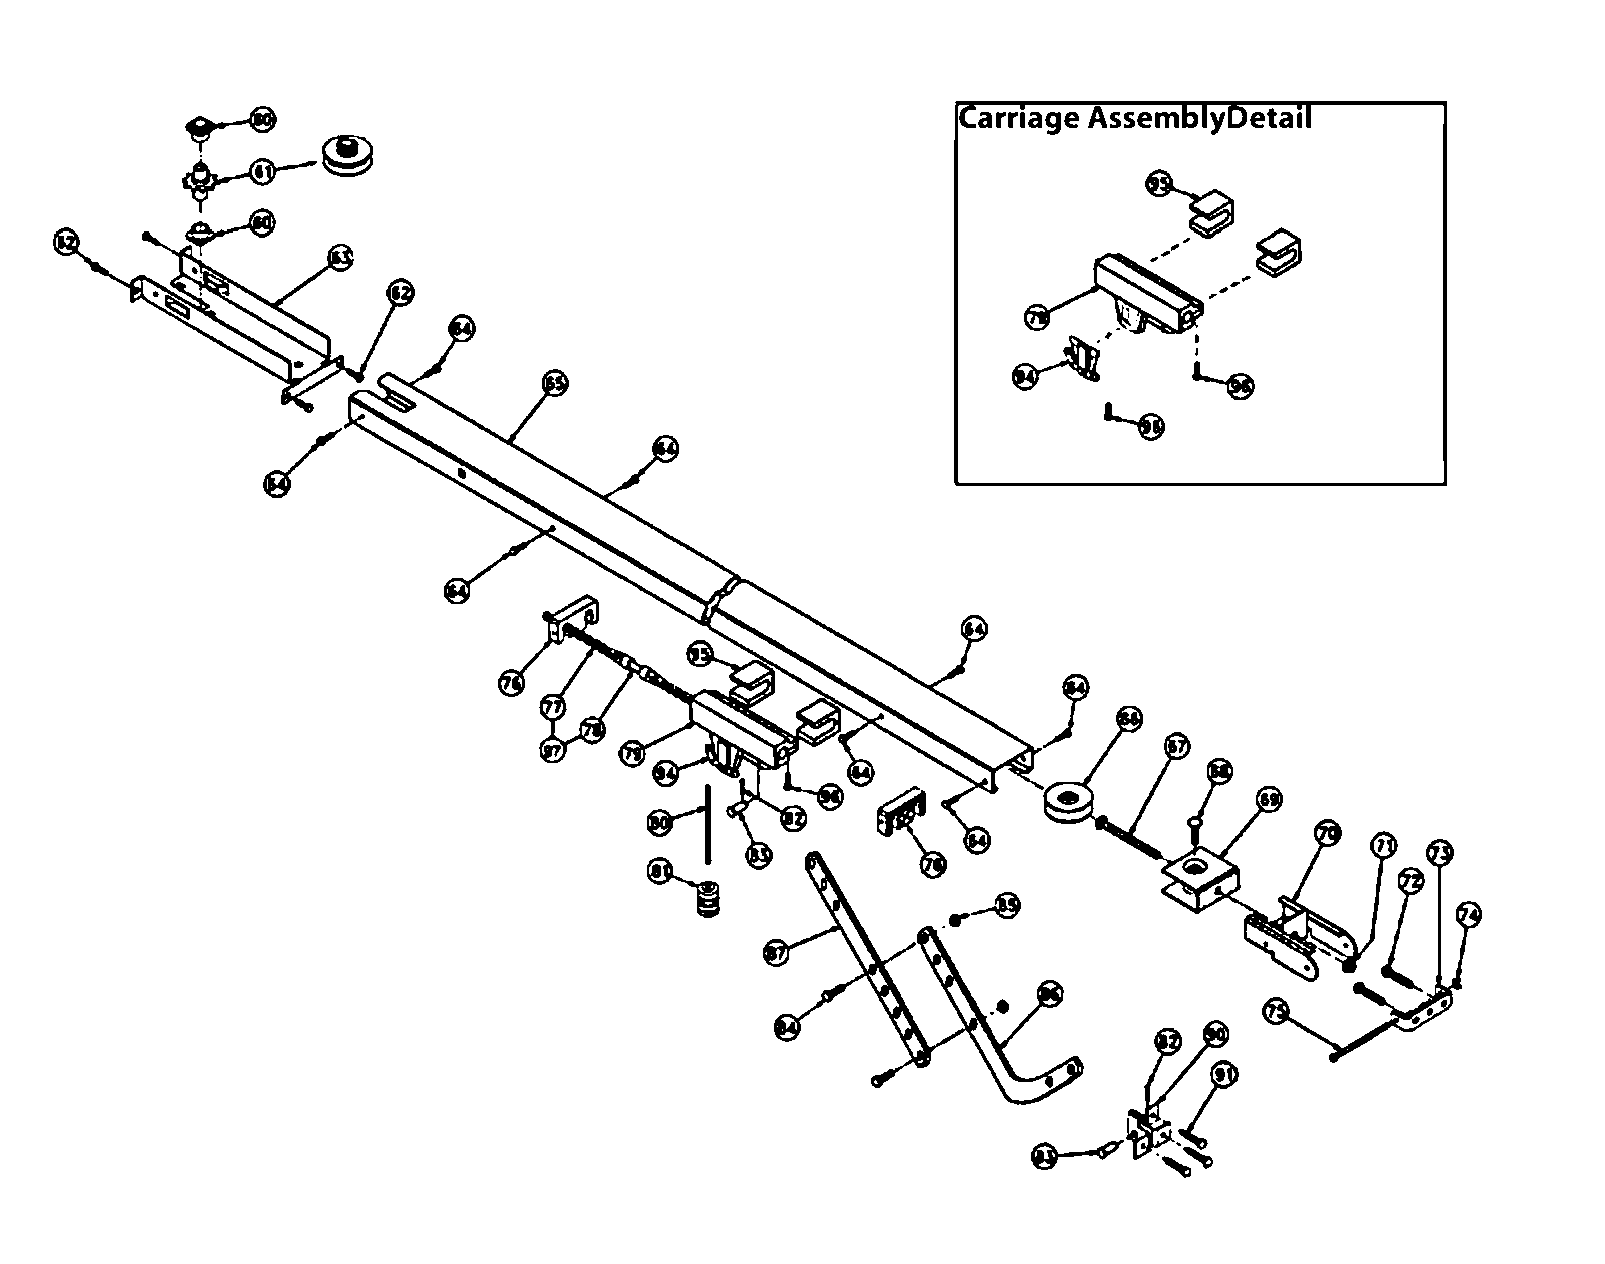 genie garage door parts diagram 2002 mitsubishi lancer oz rally radio wiring belt drive and list for model pmx500icb